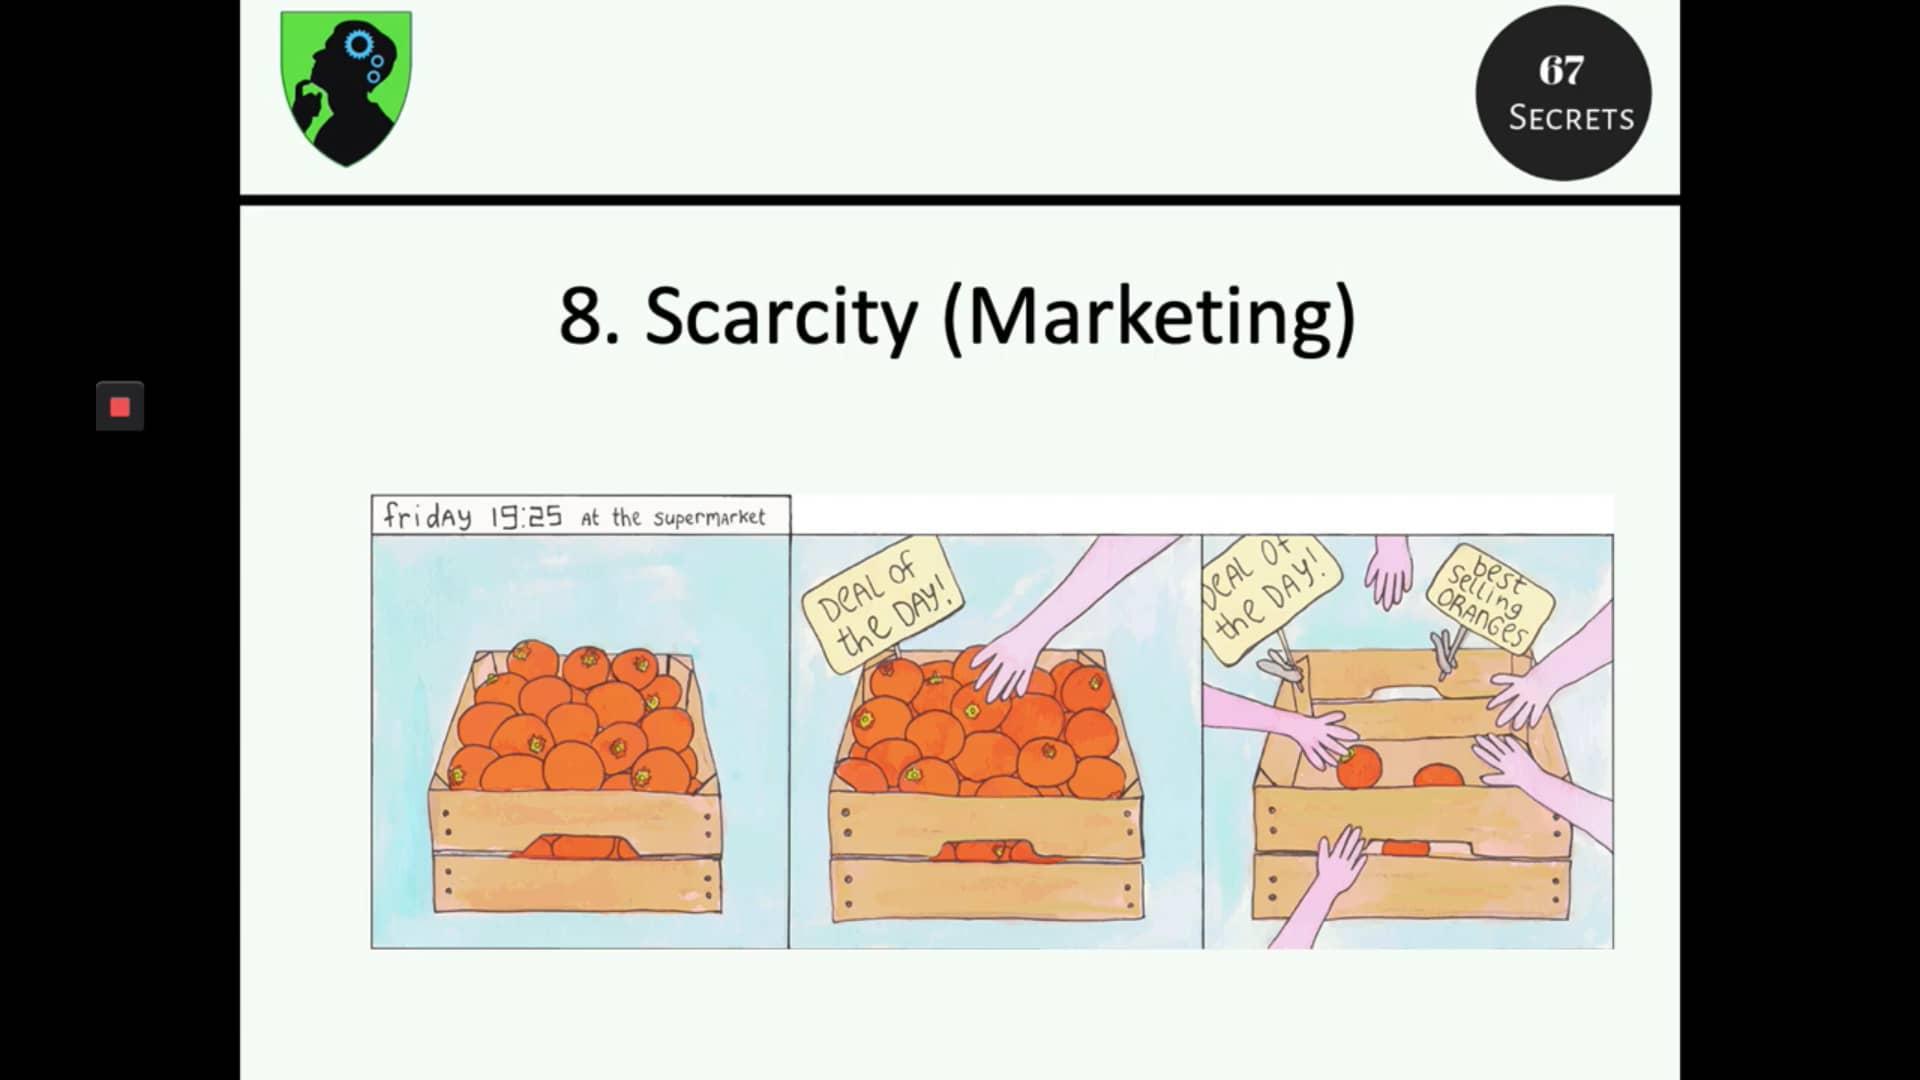 8. Scarcity Marketing